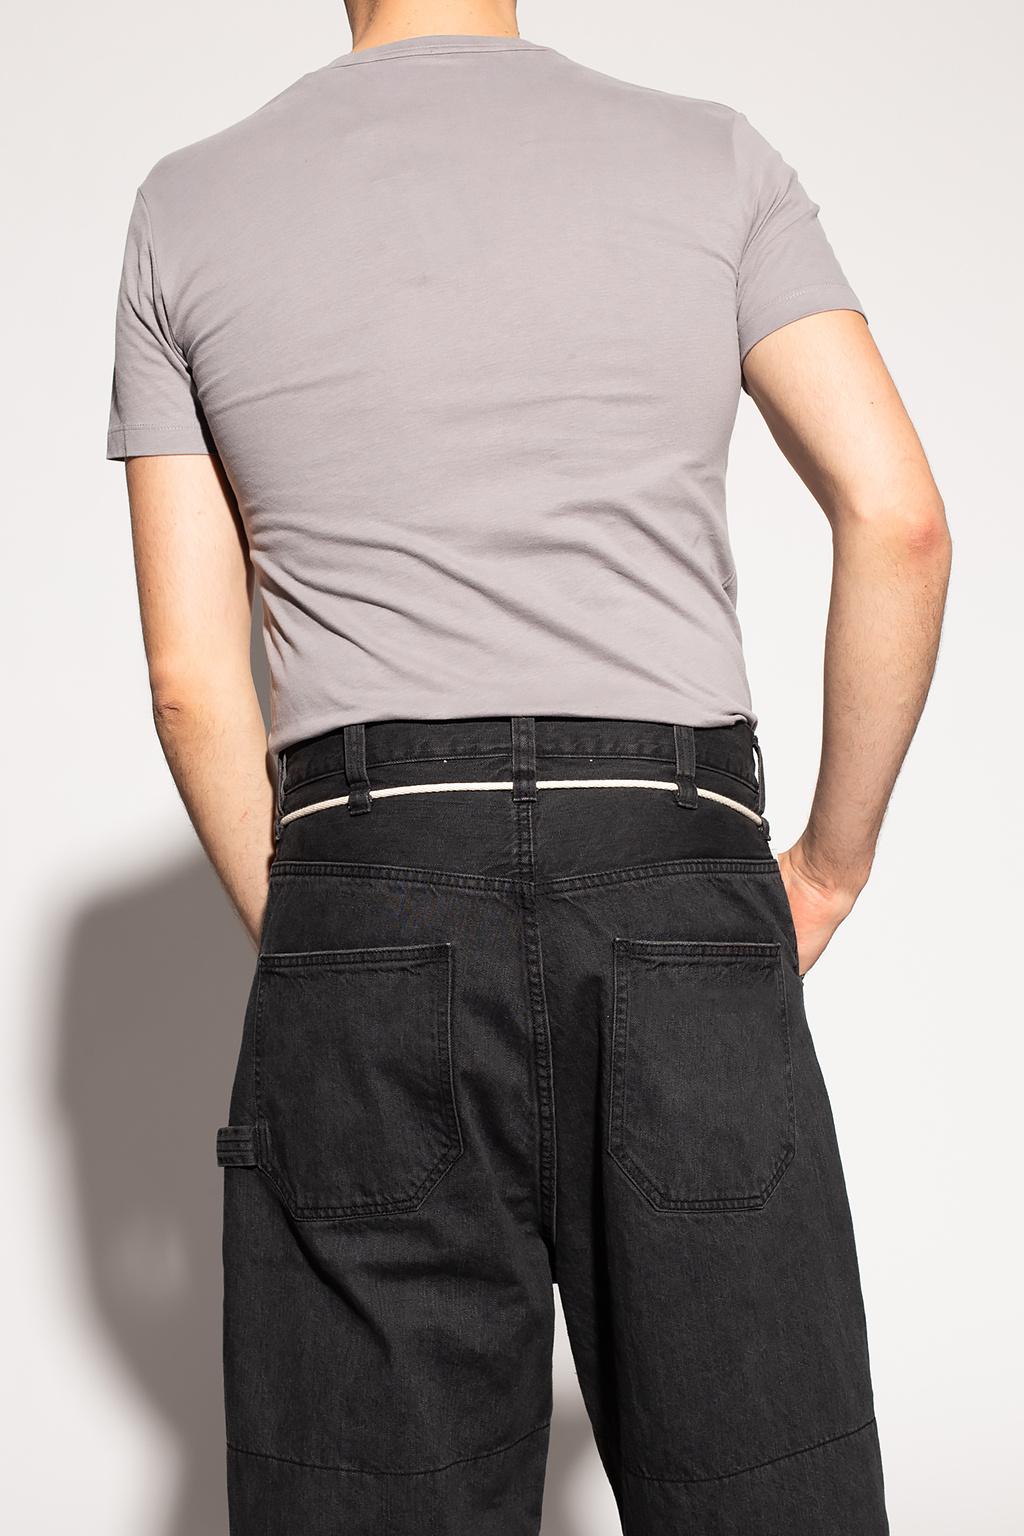 AllSaints 'Brace' T-shirt with logo